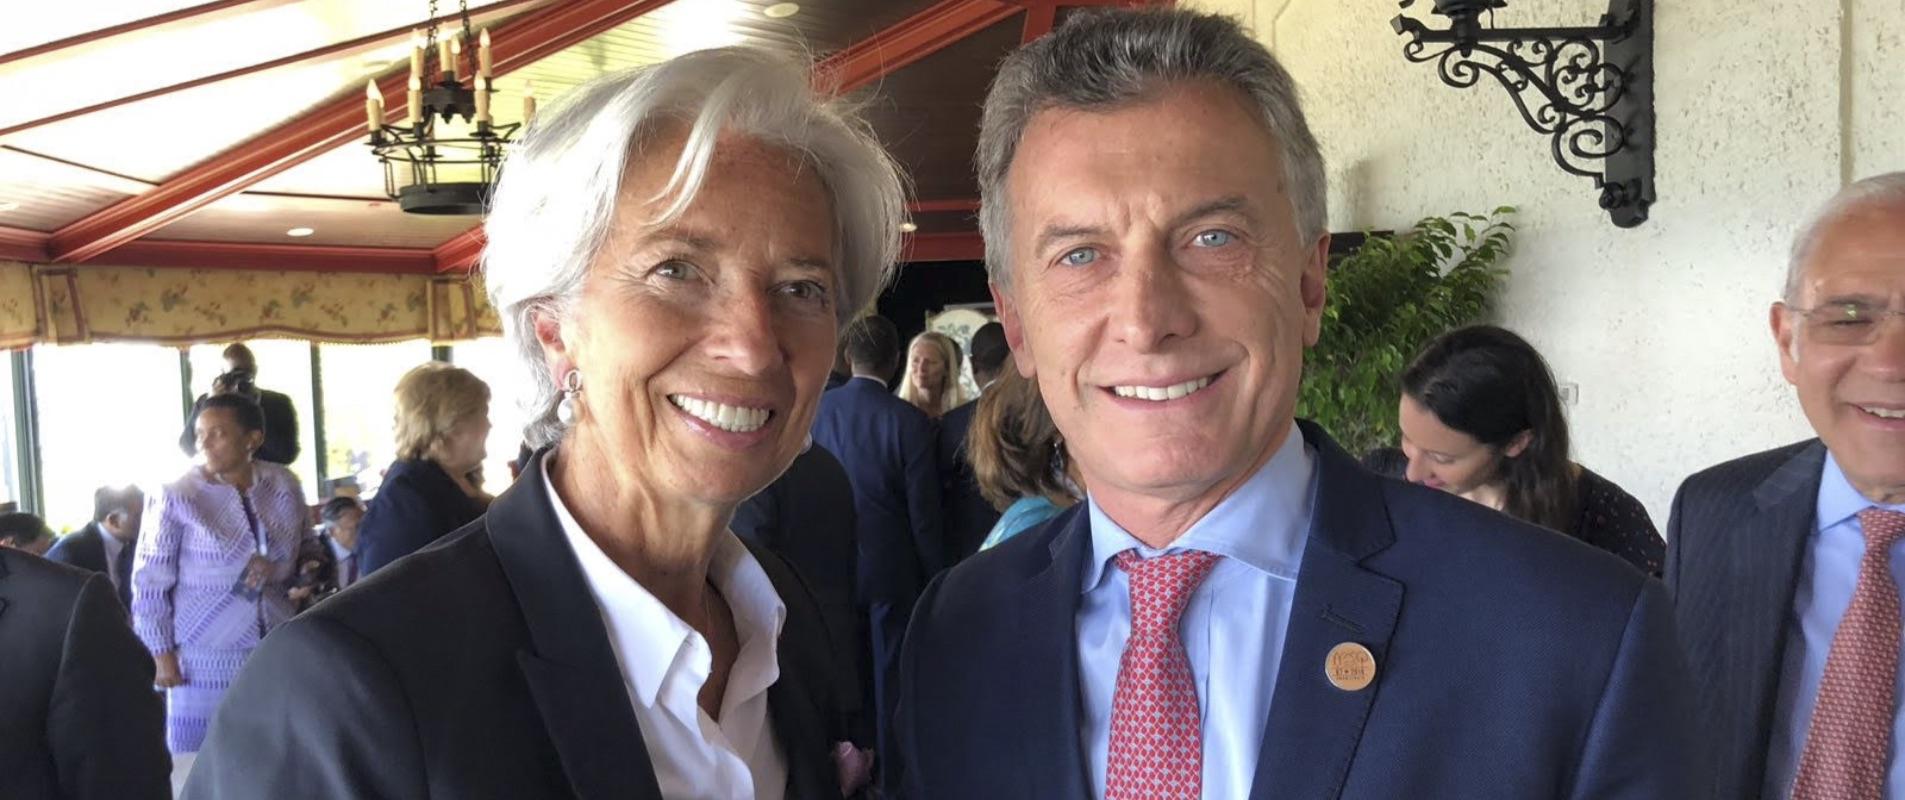 Christian Lagarde, titular del FMI, junto al presidente Mauricio Macri